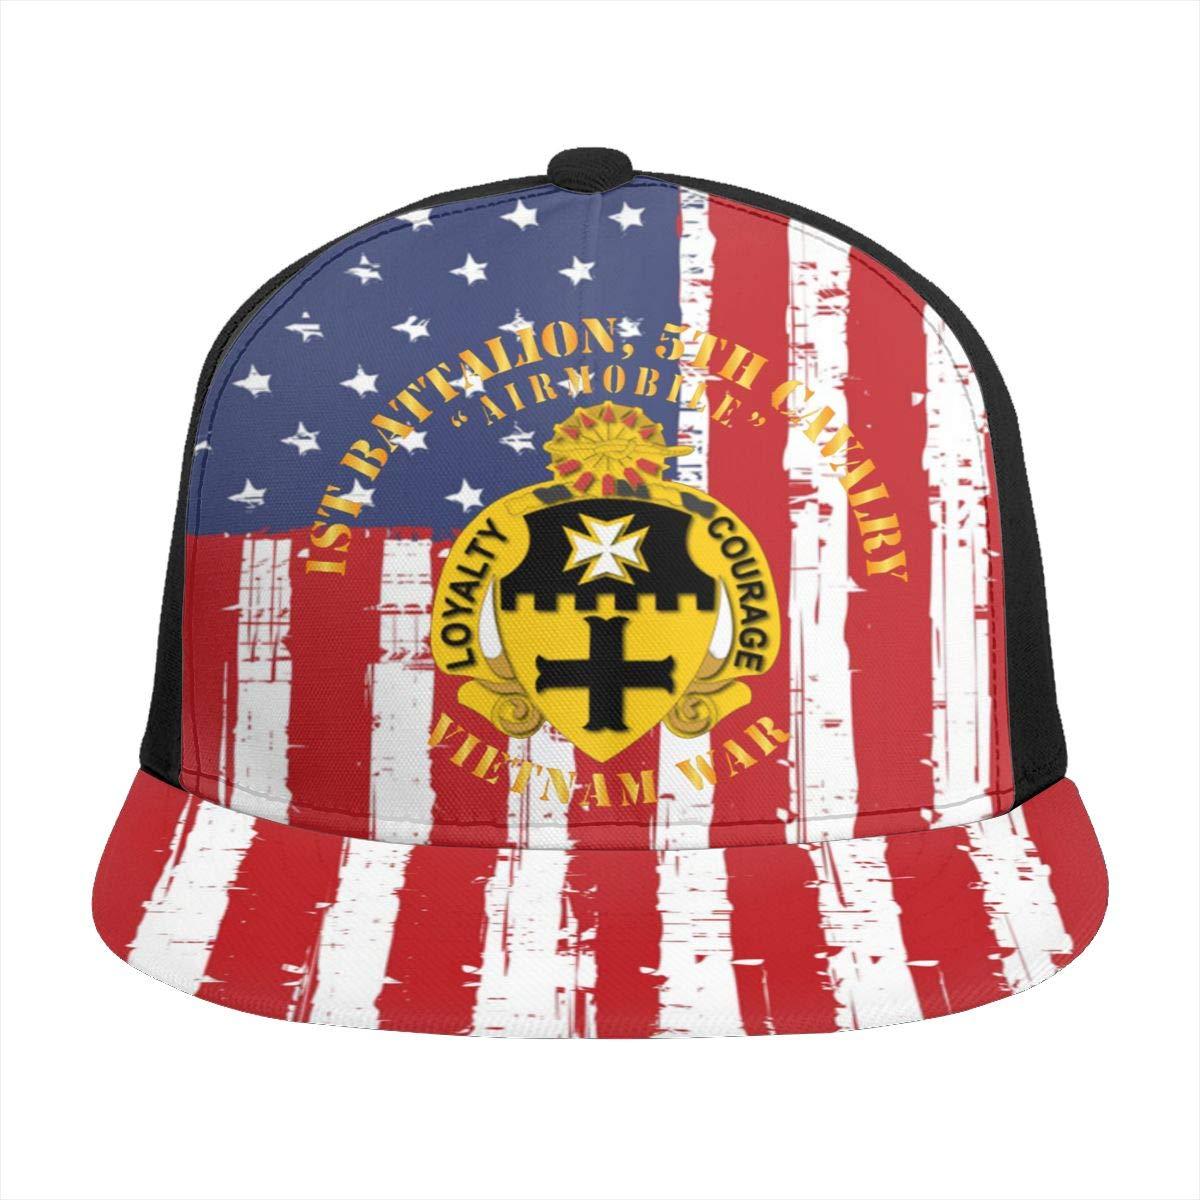 1st Battalion 5th Cavalry Unisex Adult Hats Classic Baseball Caps Peaked Cap